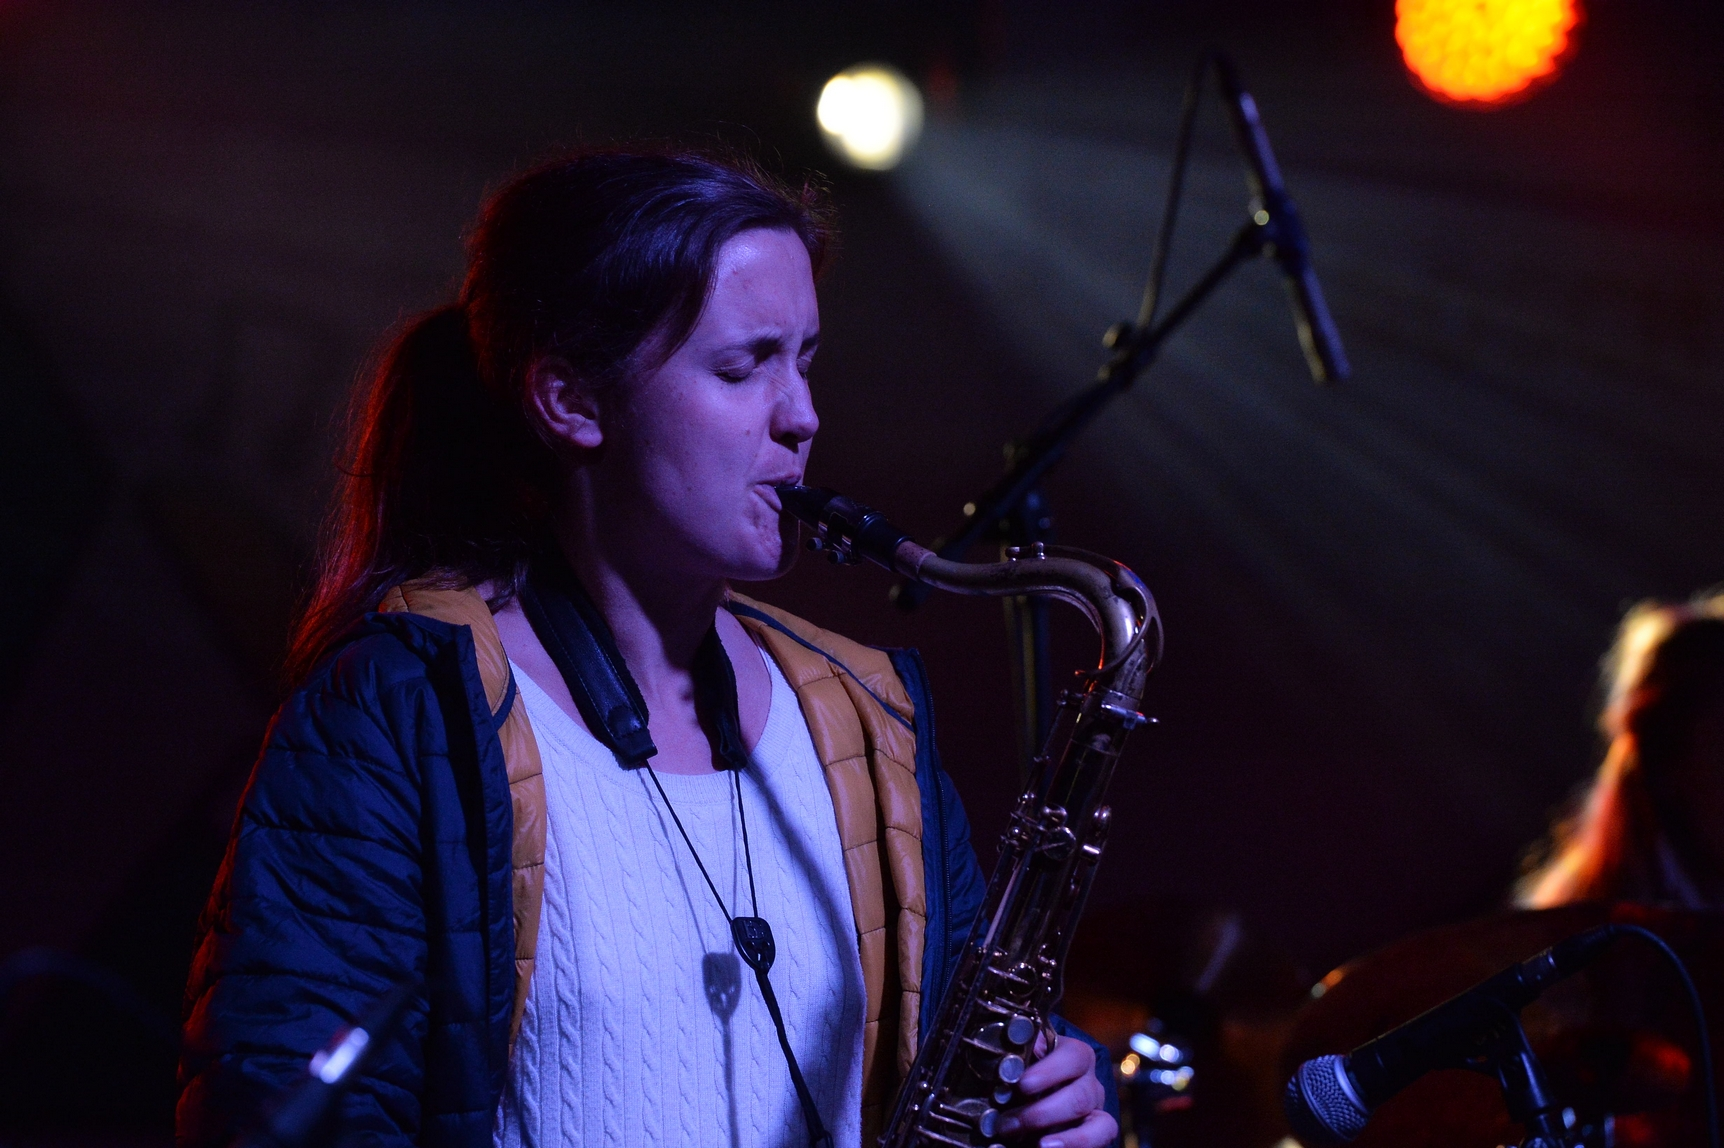 Marthe Lea Bugge  at Smida Jazz Festival 2017